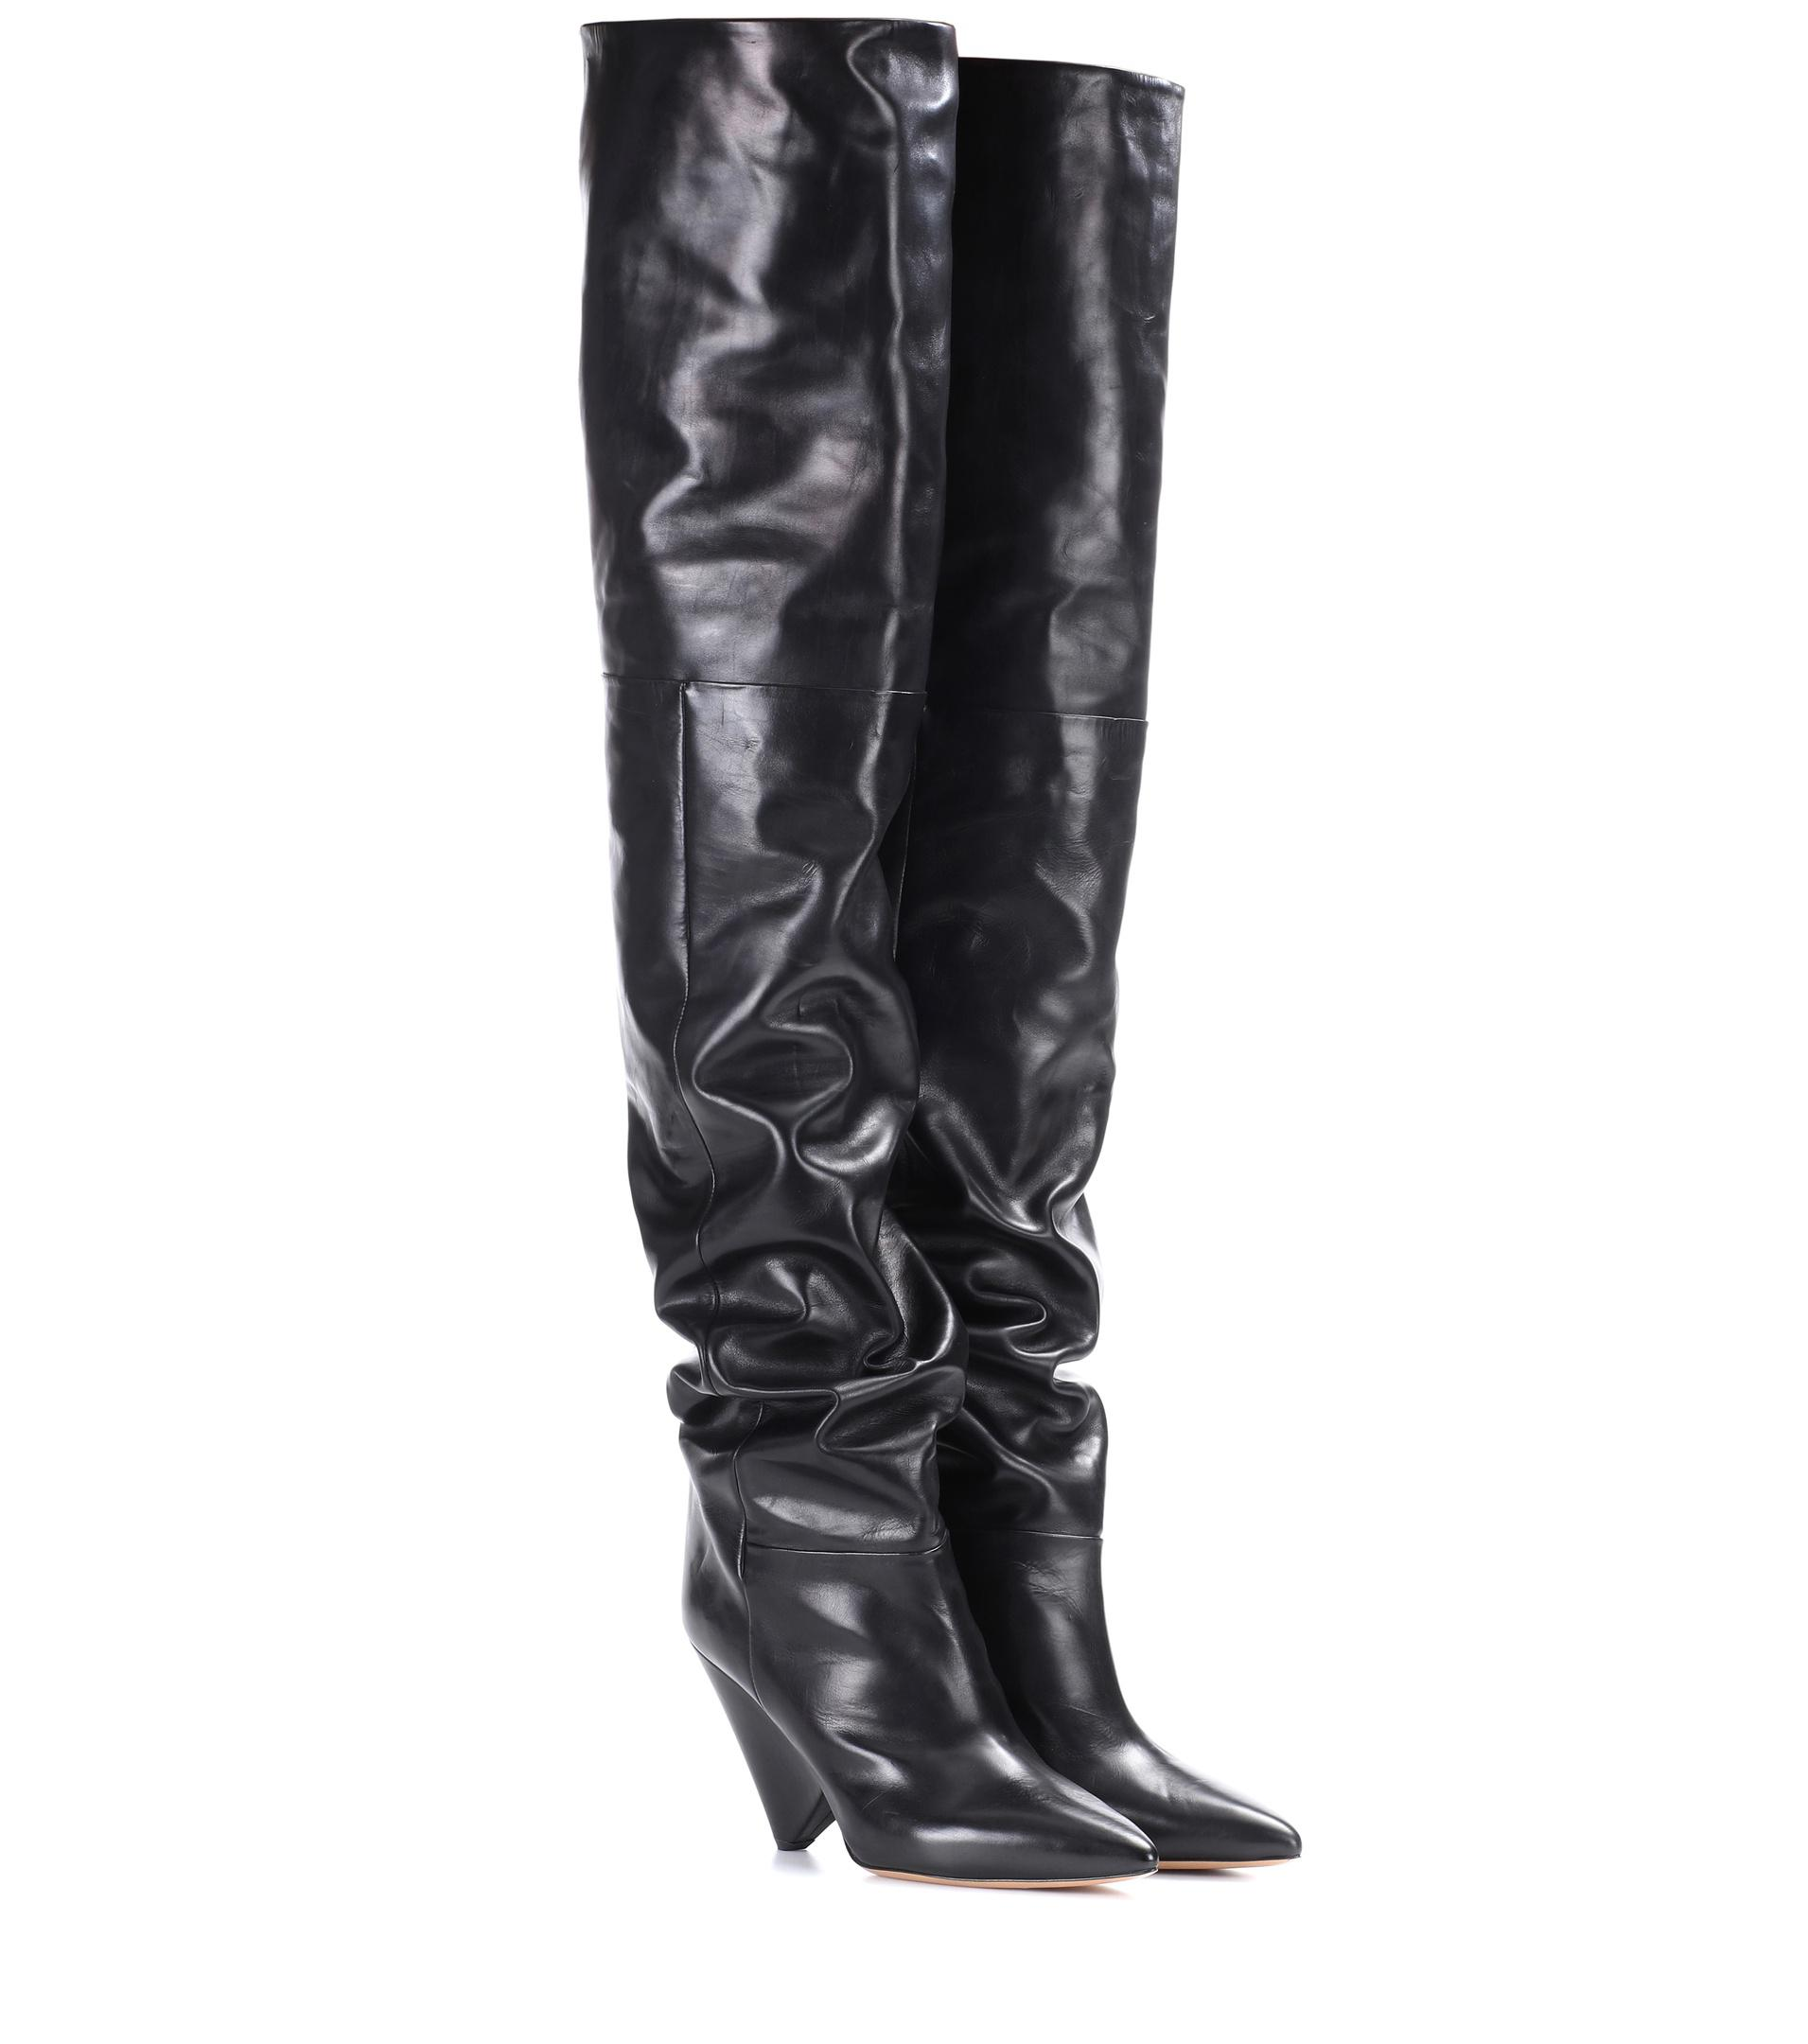 3fc13570040 Lyst - Isabel Marant Lostynn Leather Boots in Black